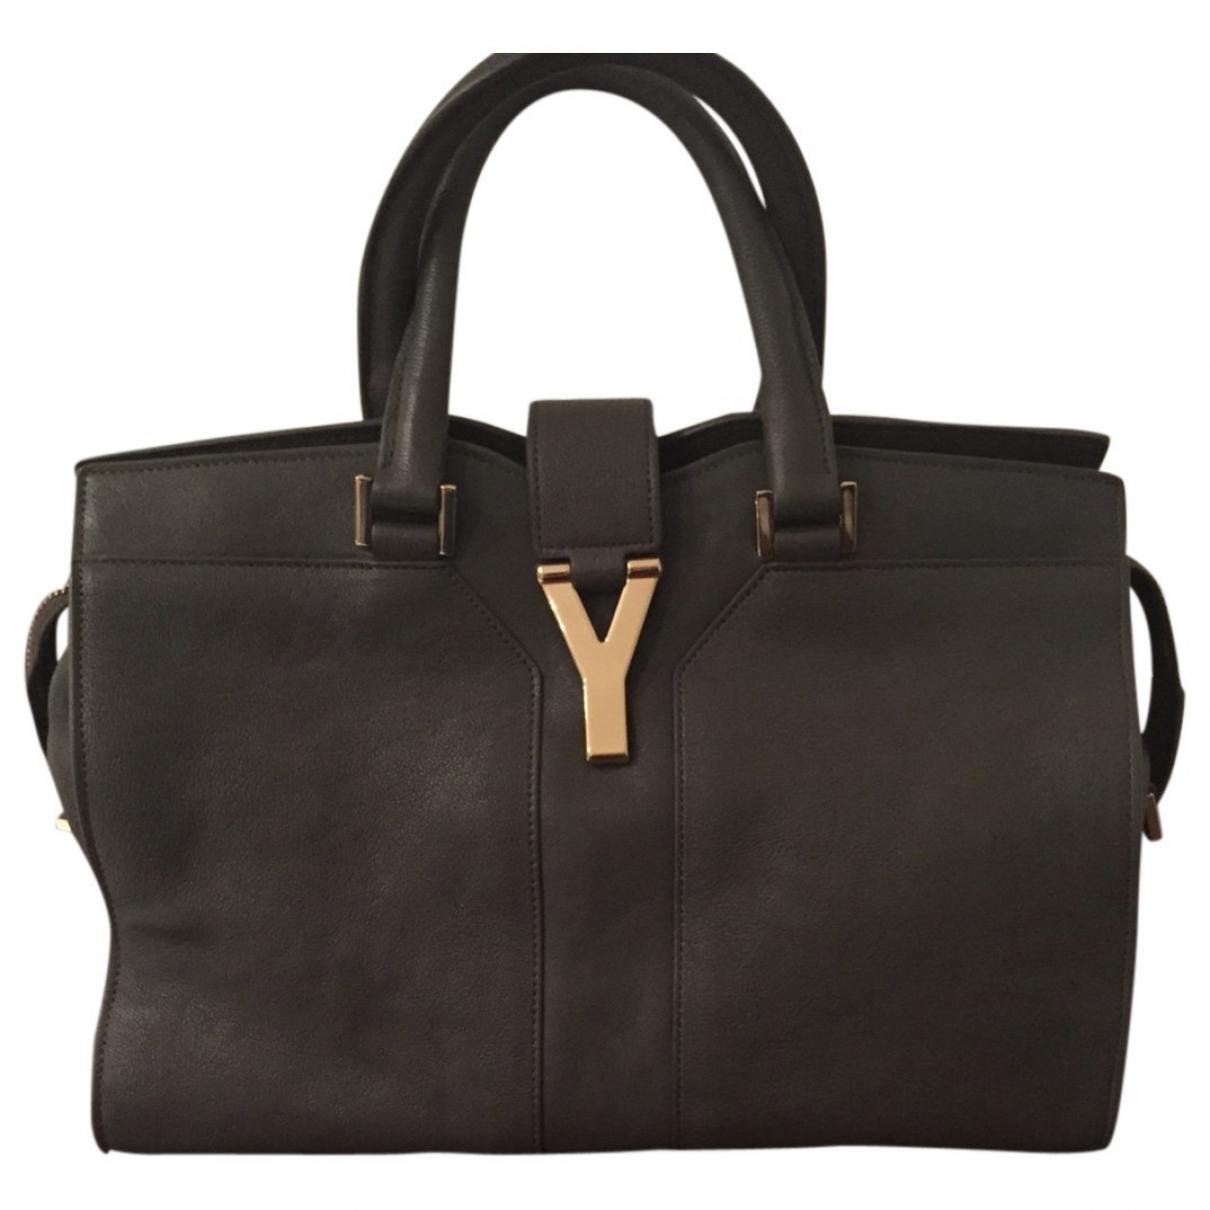 Yves Saint Laurent Chyc Handtasche in  Grau Leder